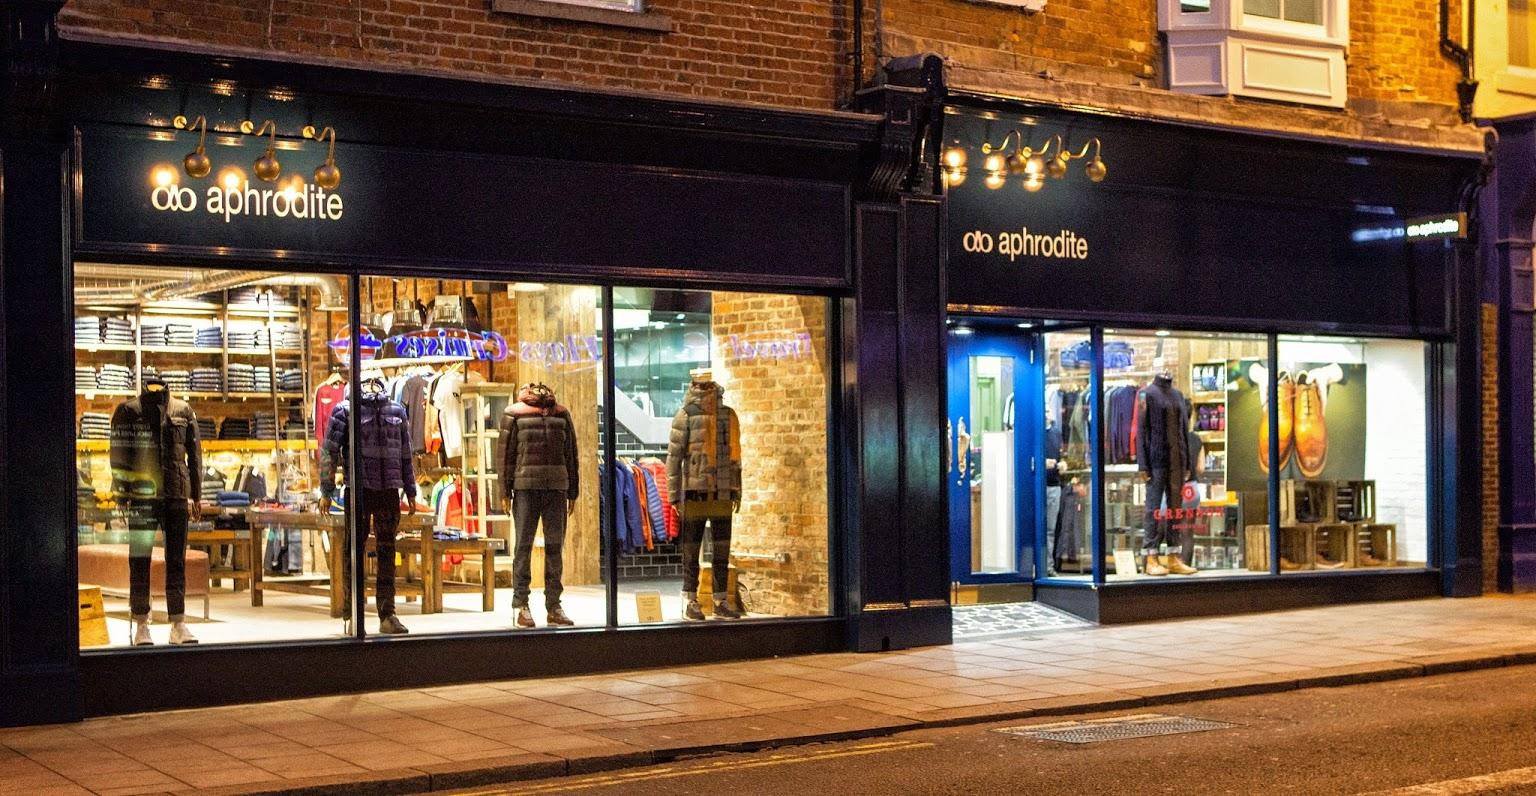 Aphrodite Store Sunderland